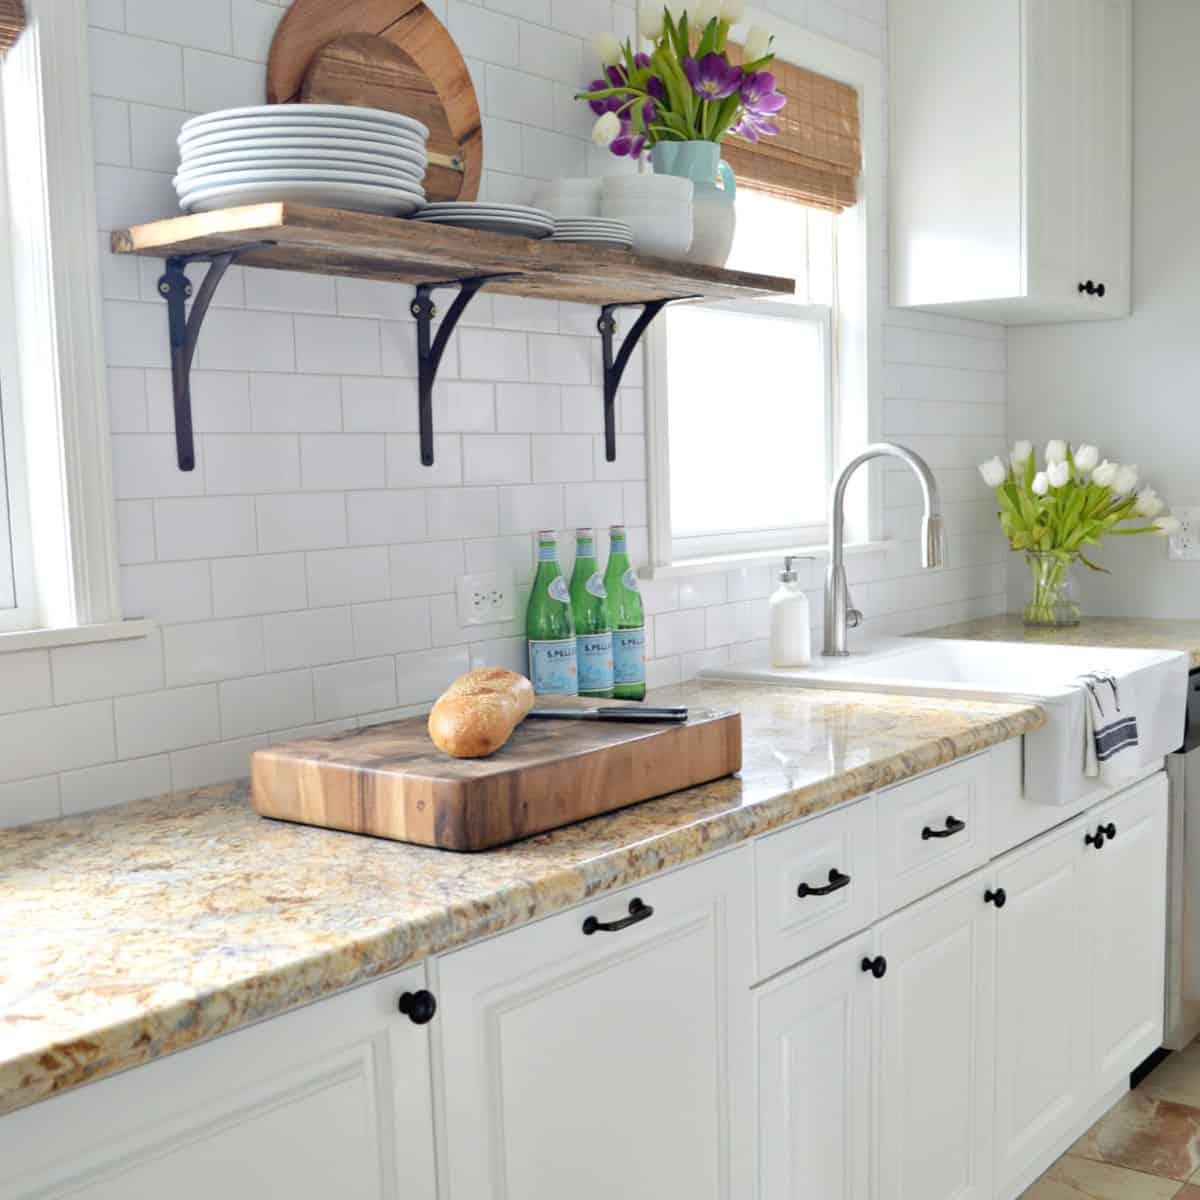 white kitchen cabinets in small galley kitchen